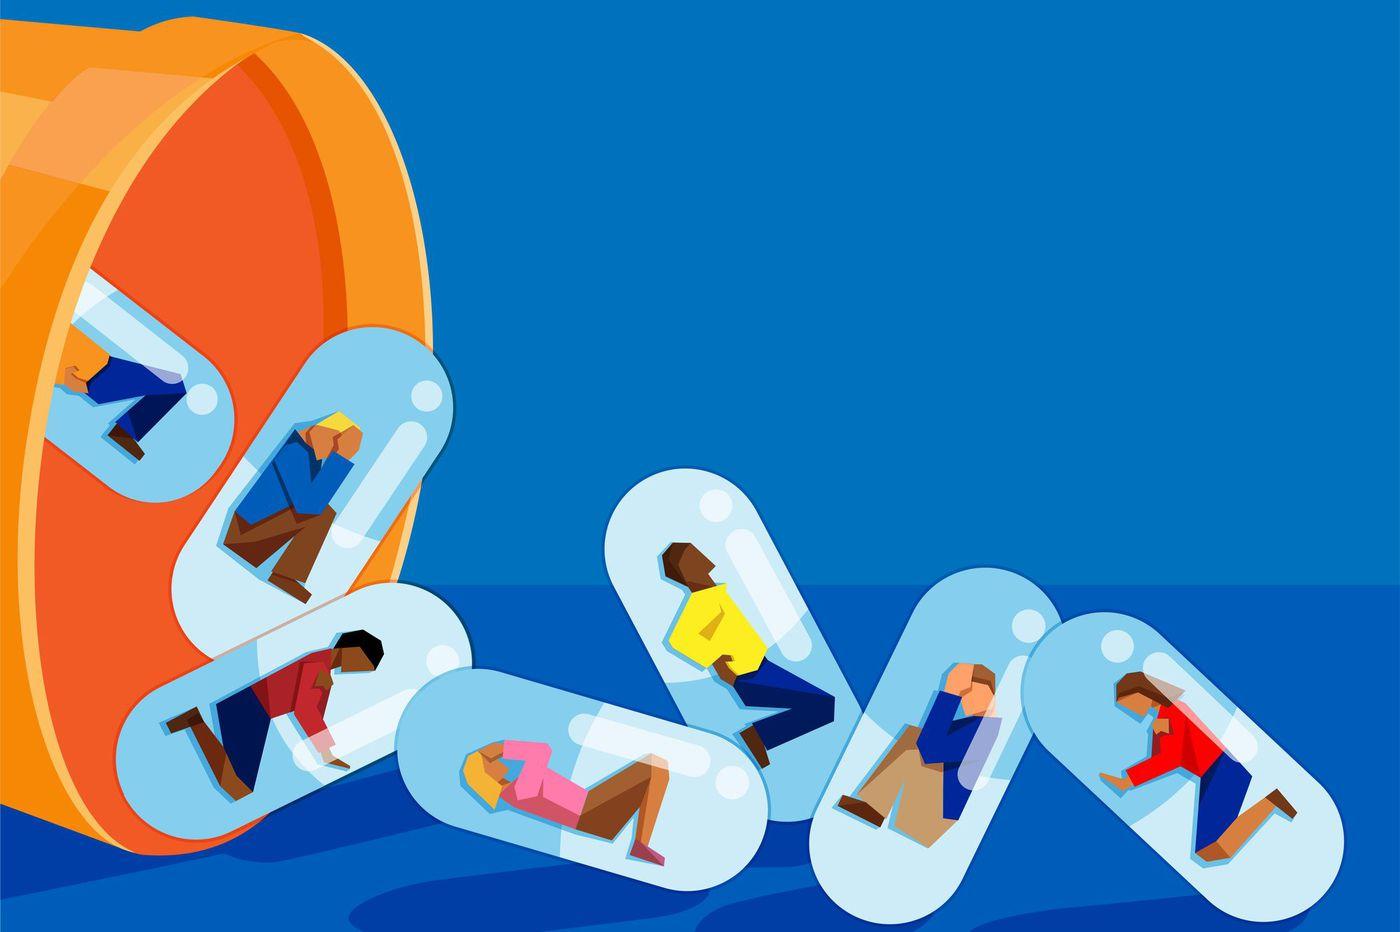 Doling out pain pills post-surgery: An ingrown toenail not the same as a bypass